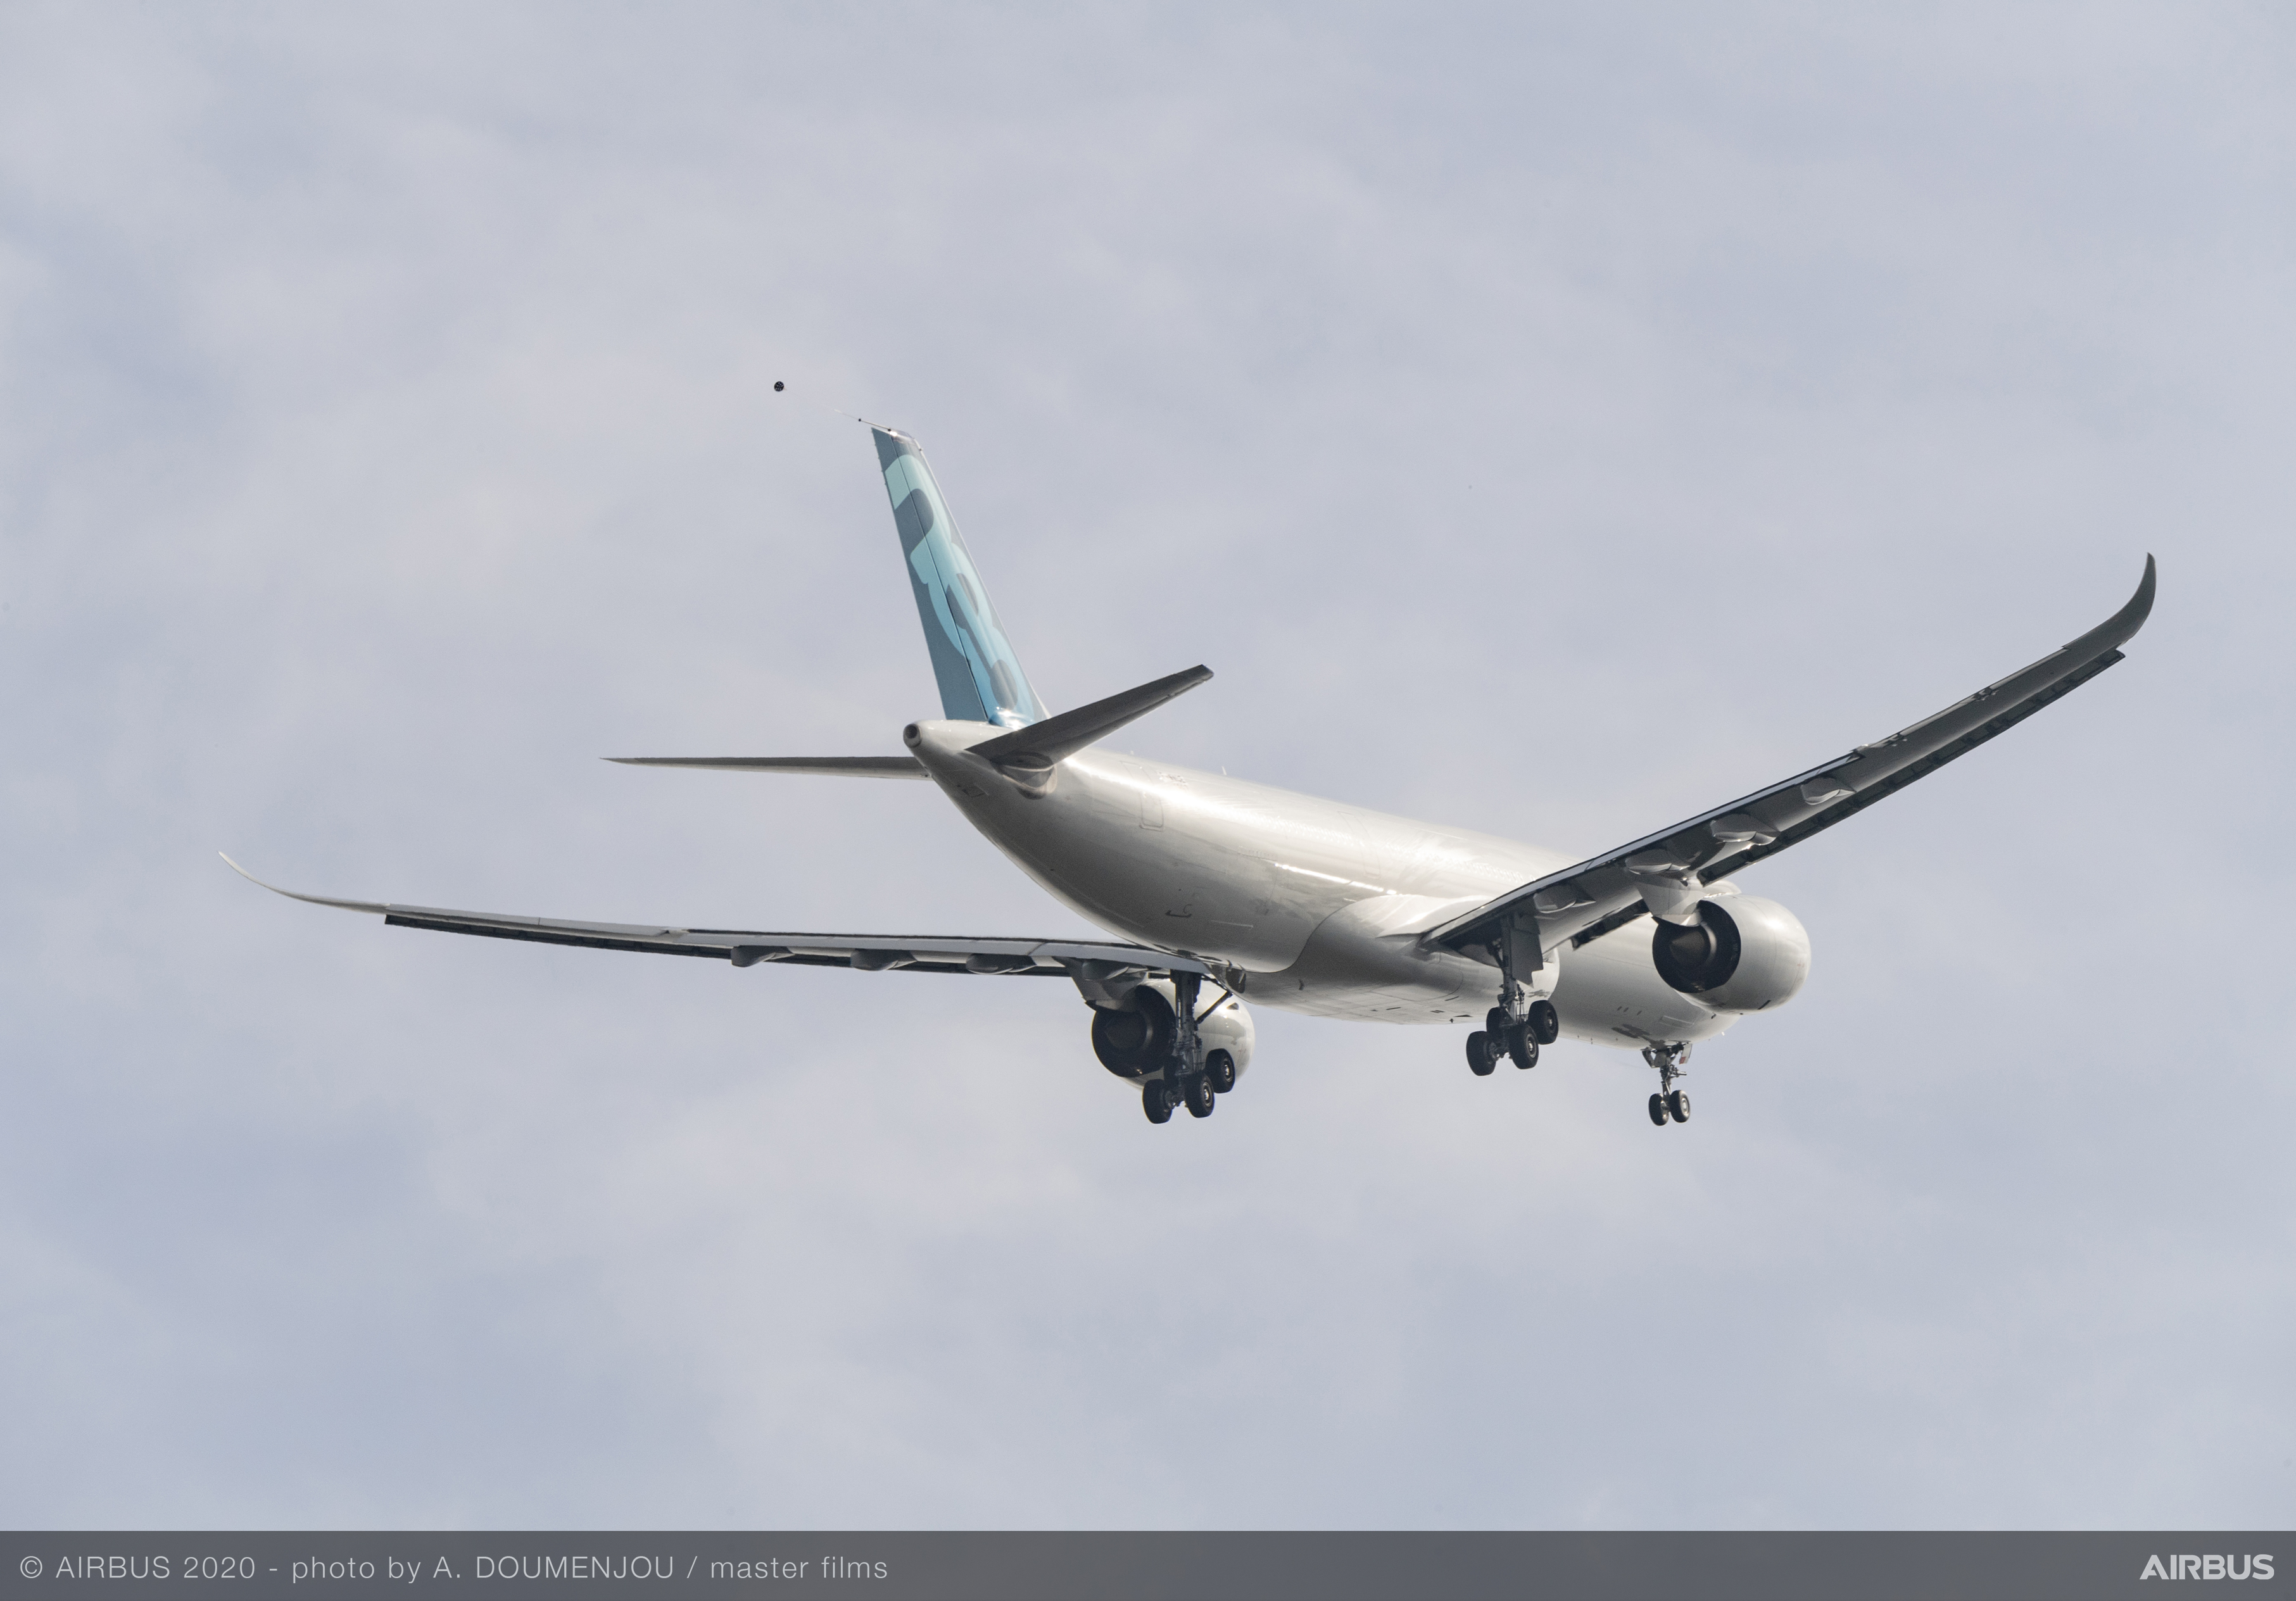 A330-900-Airbus-MSN1967-251-tonnes-first-flight-006